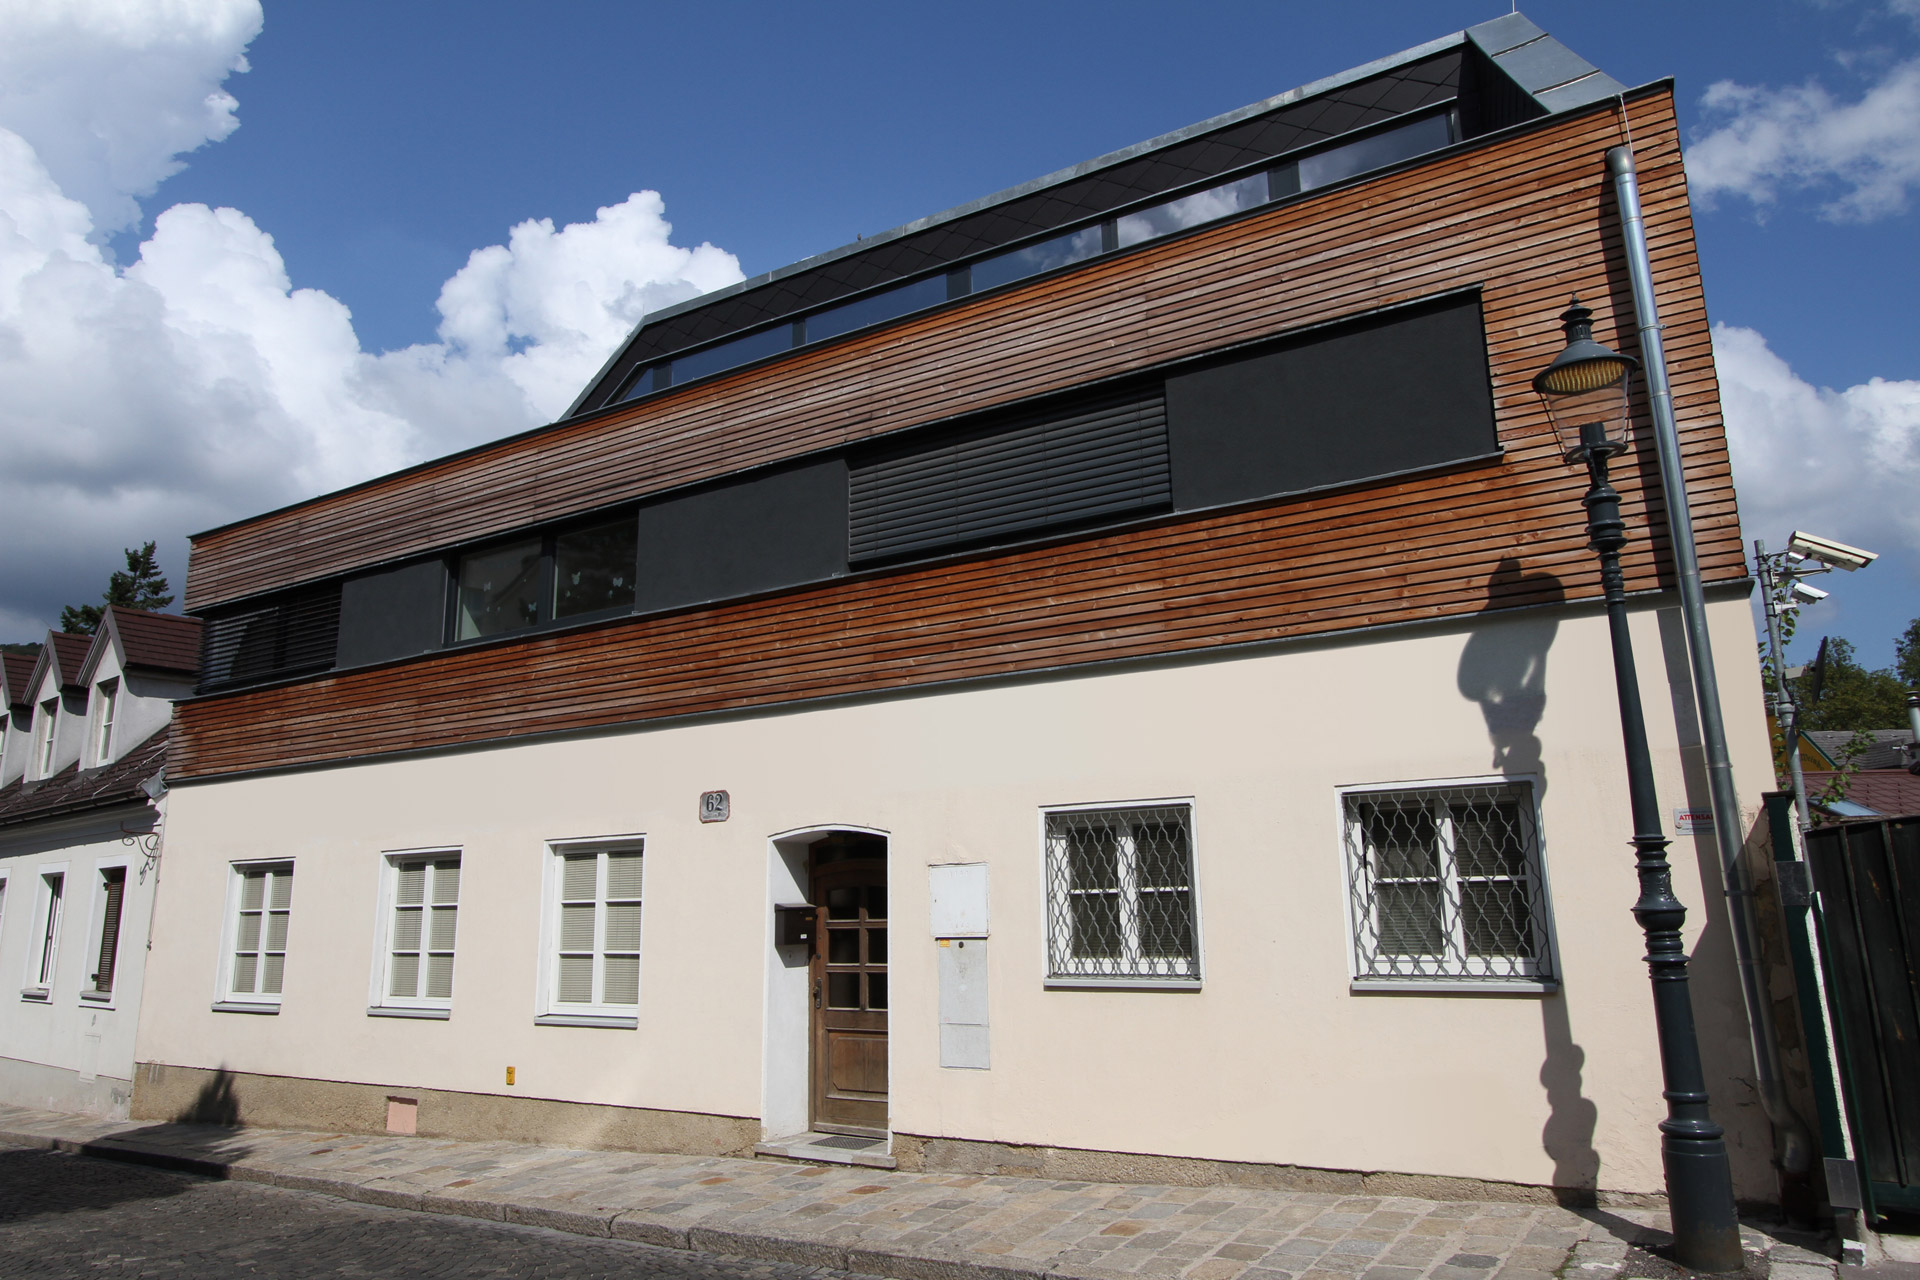 Wallner + Partner ZT GmbH - Statik, Bauphysik, Gutachten, Haustechnik, Baumanagement